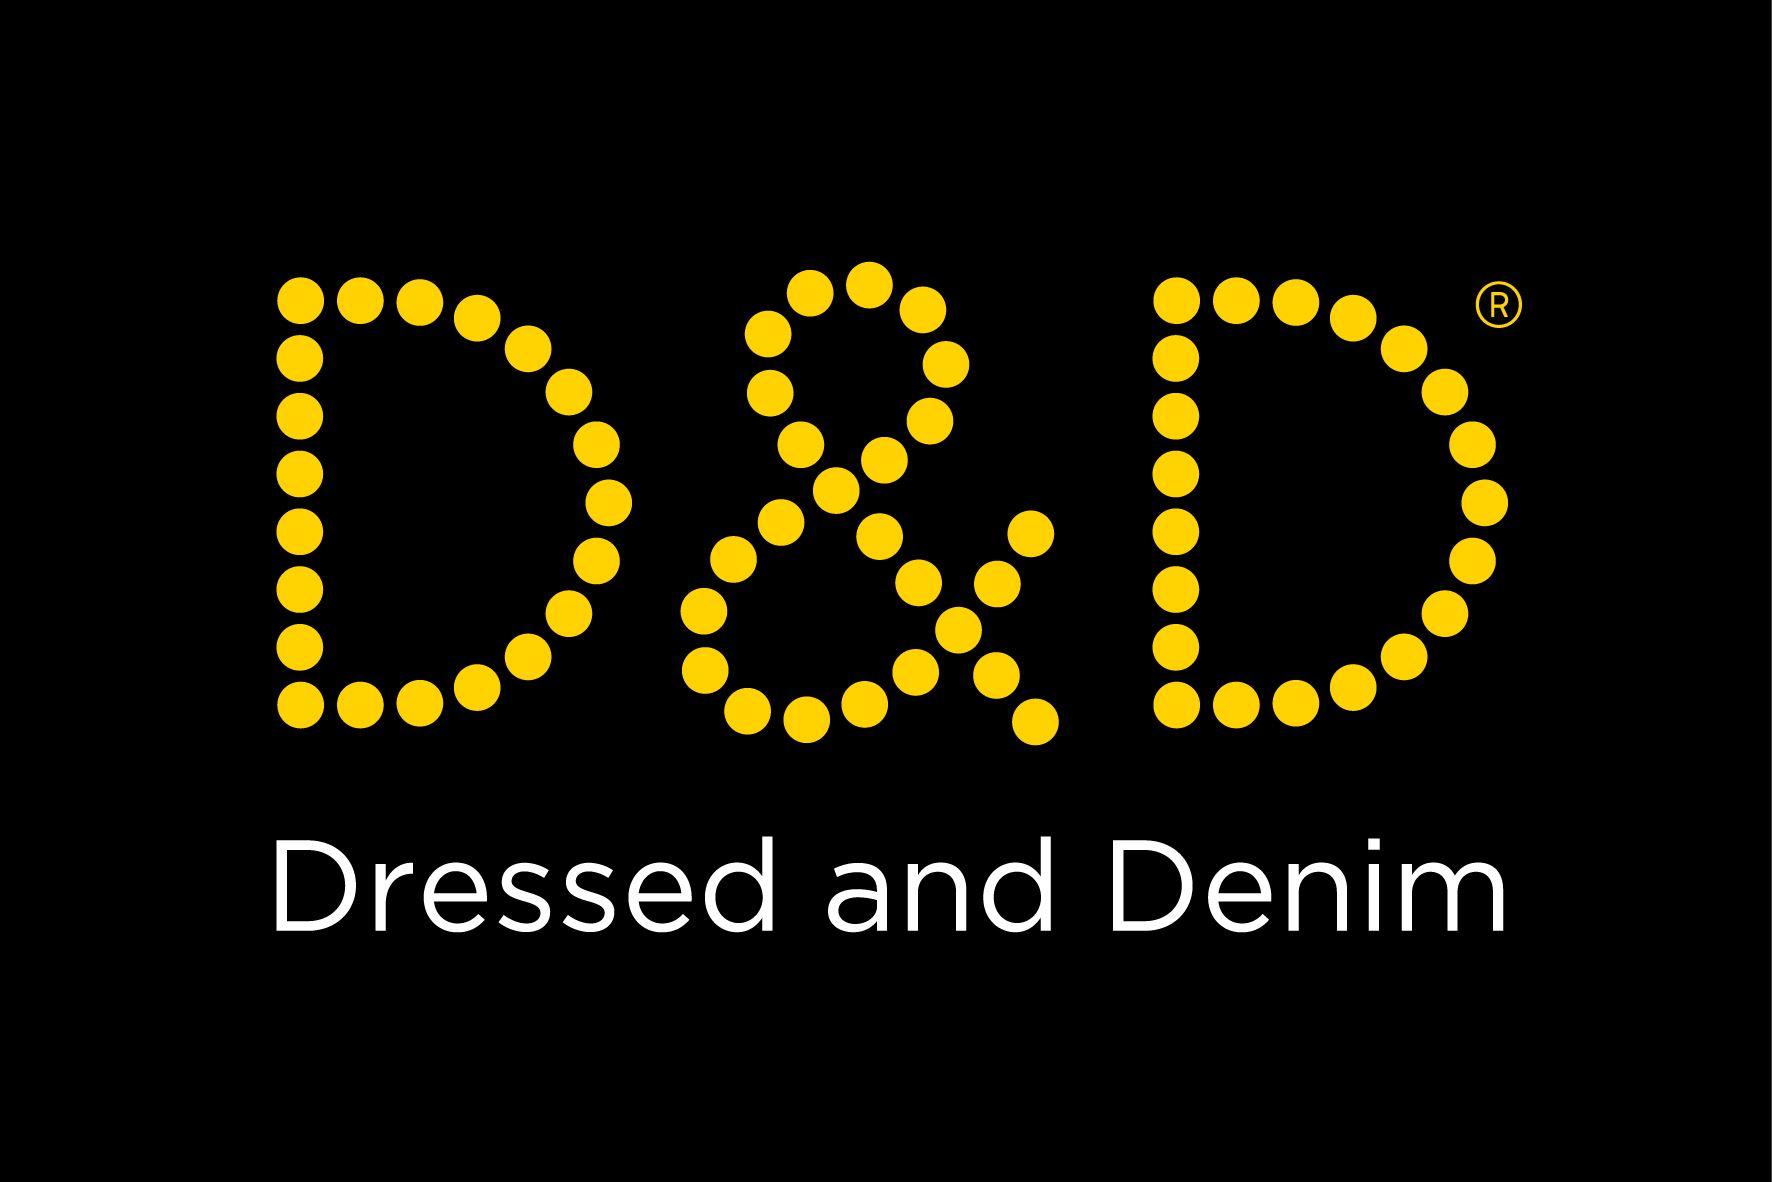 D&D, Dressed and Denim